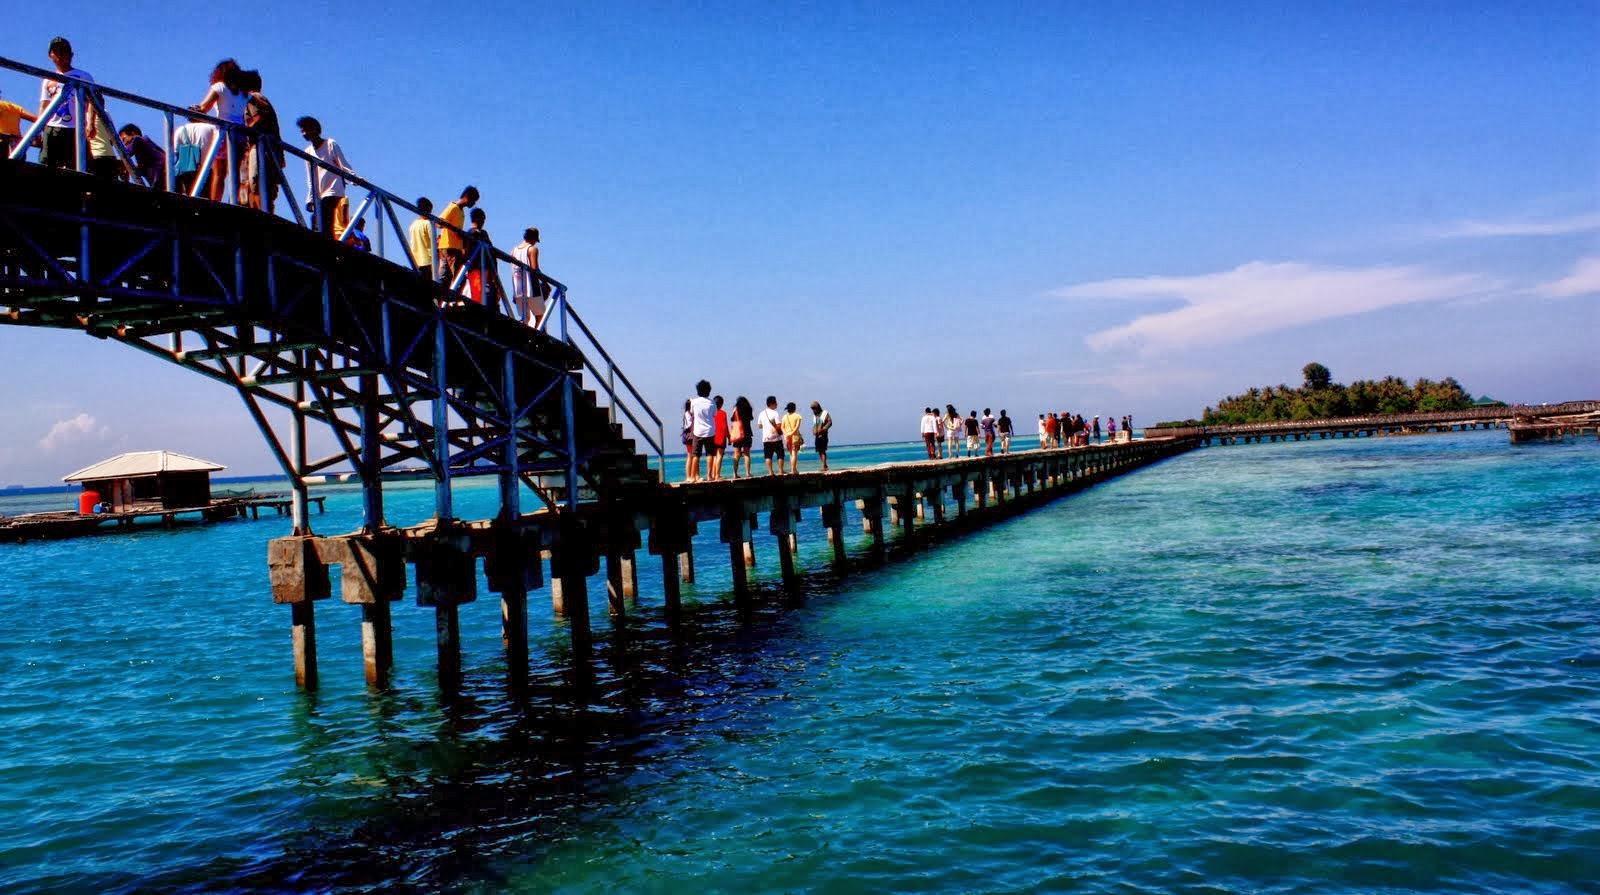 8 Tempat Wisata Pantai di Jakarta dan Sekitarnya yang Wajib